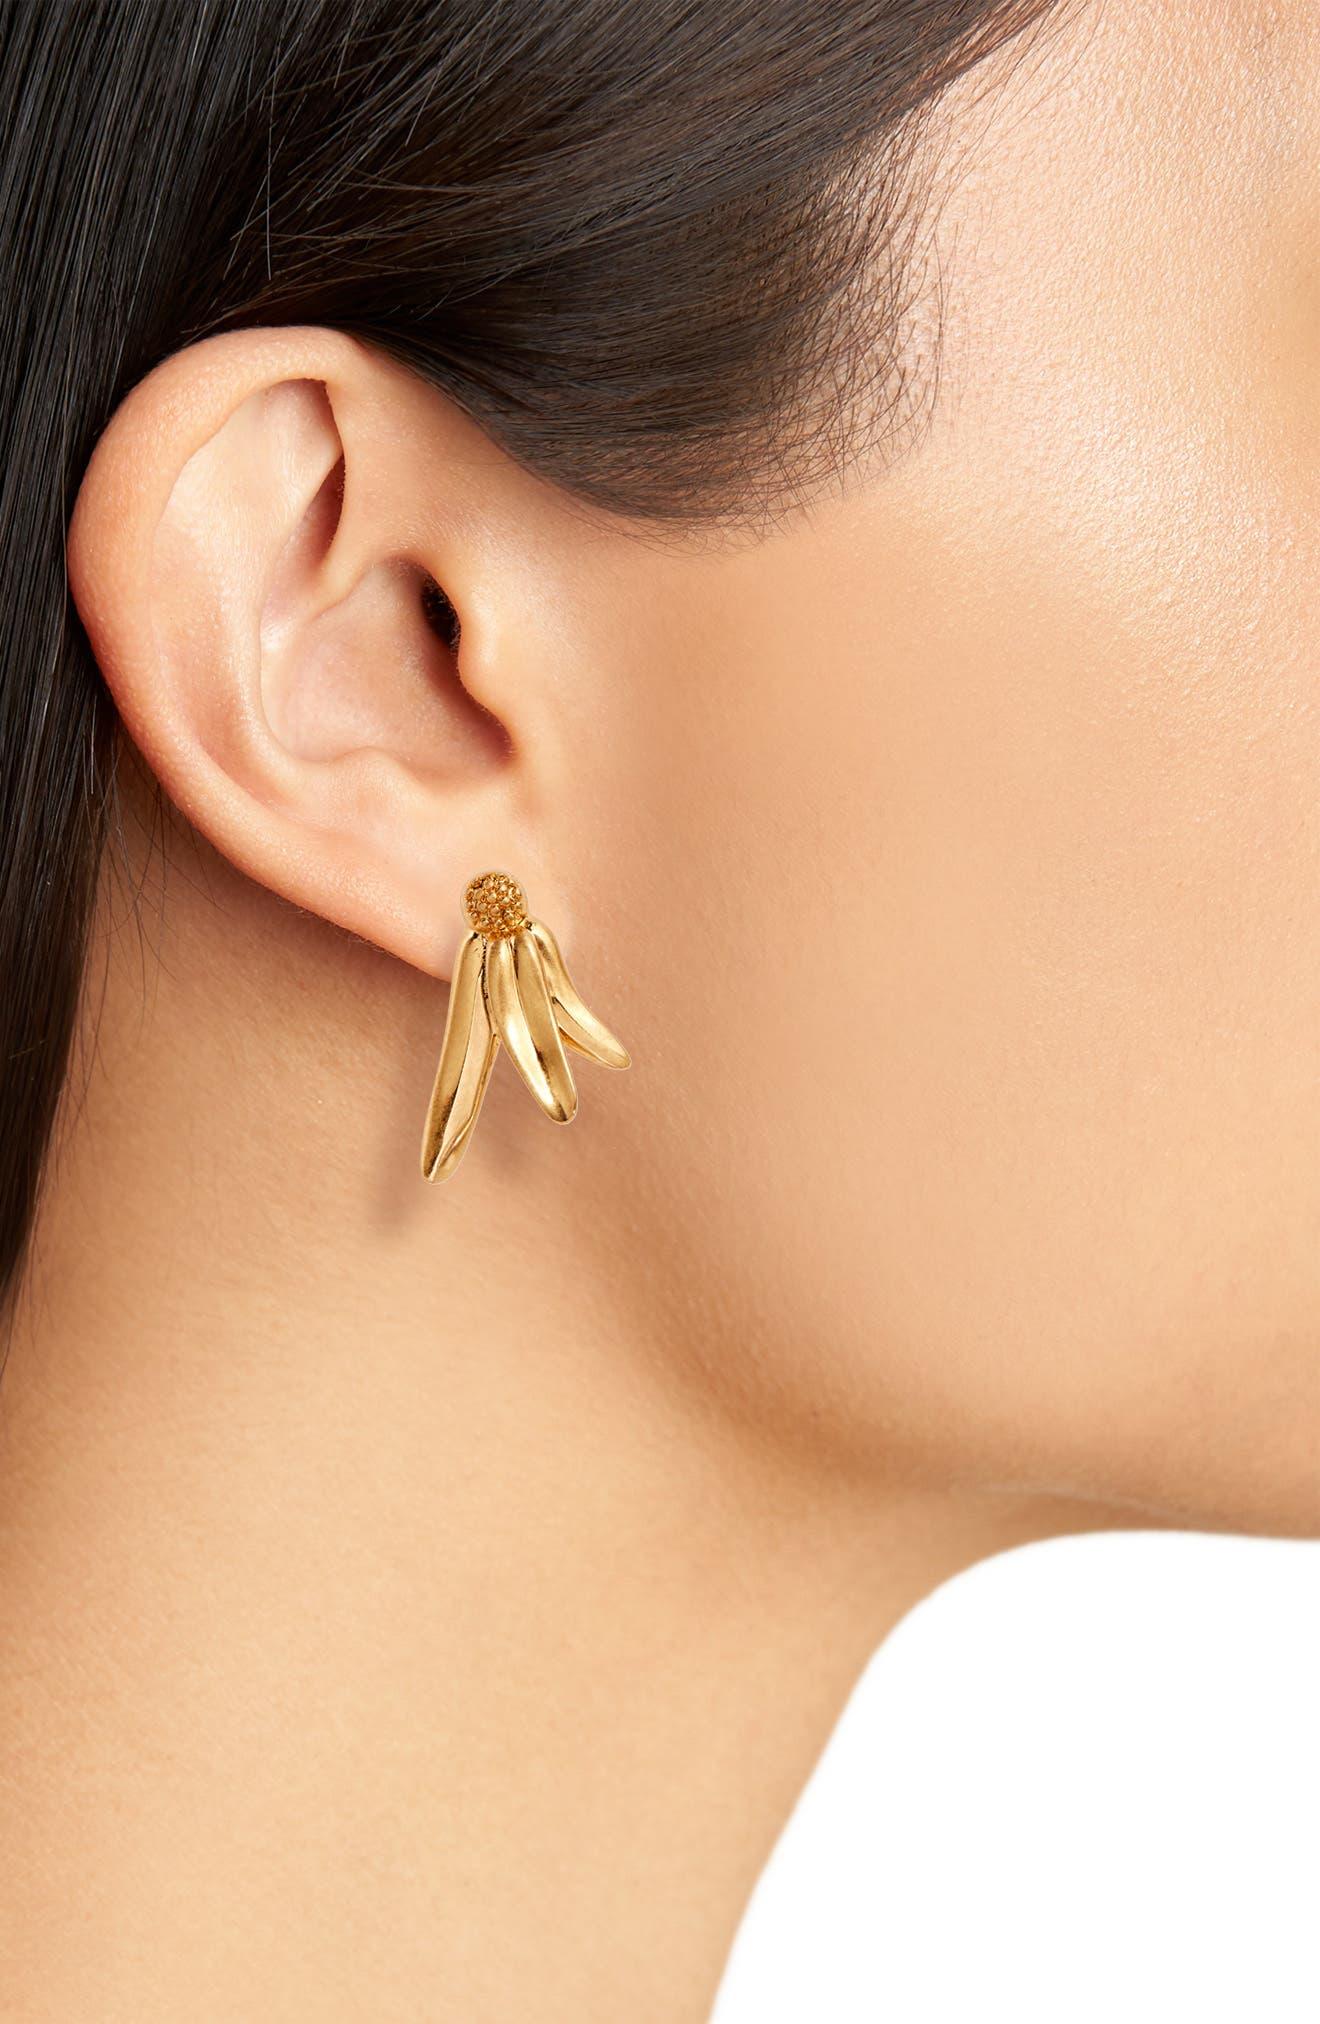 Fallen Petals Earrings,                             Alternate thumbnail 2, color,                             VINTAGE GOLD